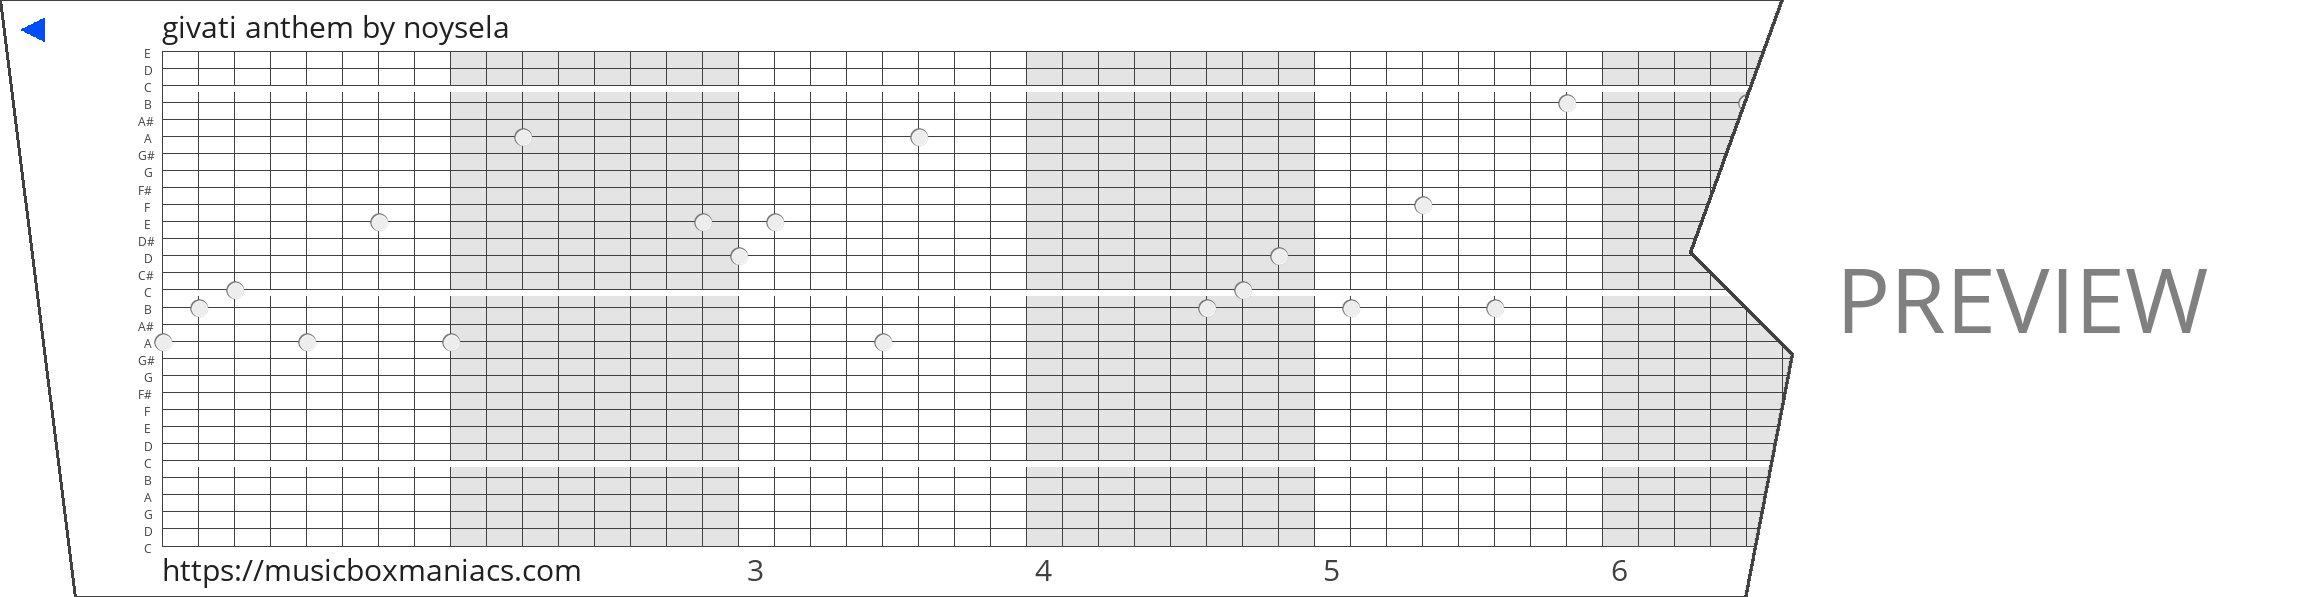 givati anthem 30 note music box paper strip